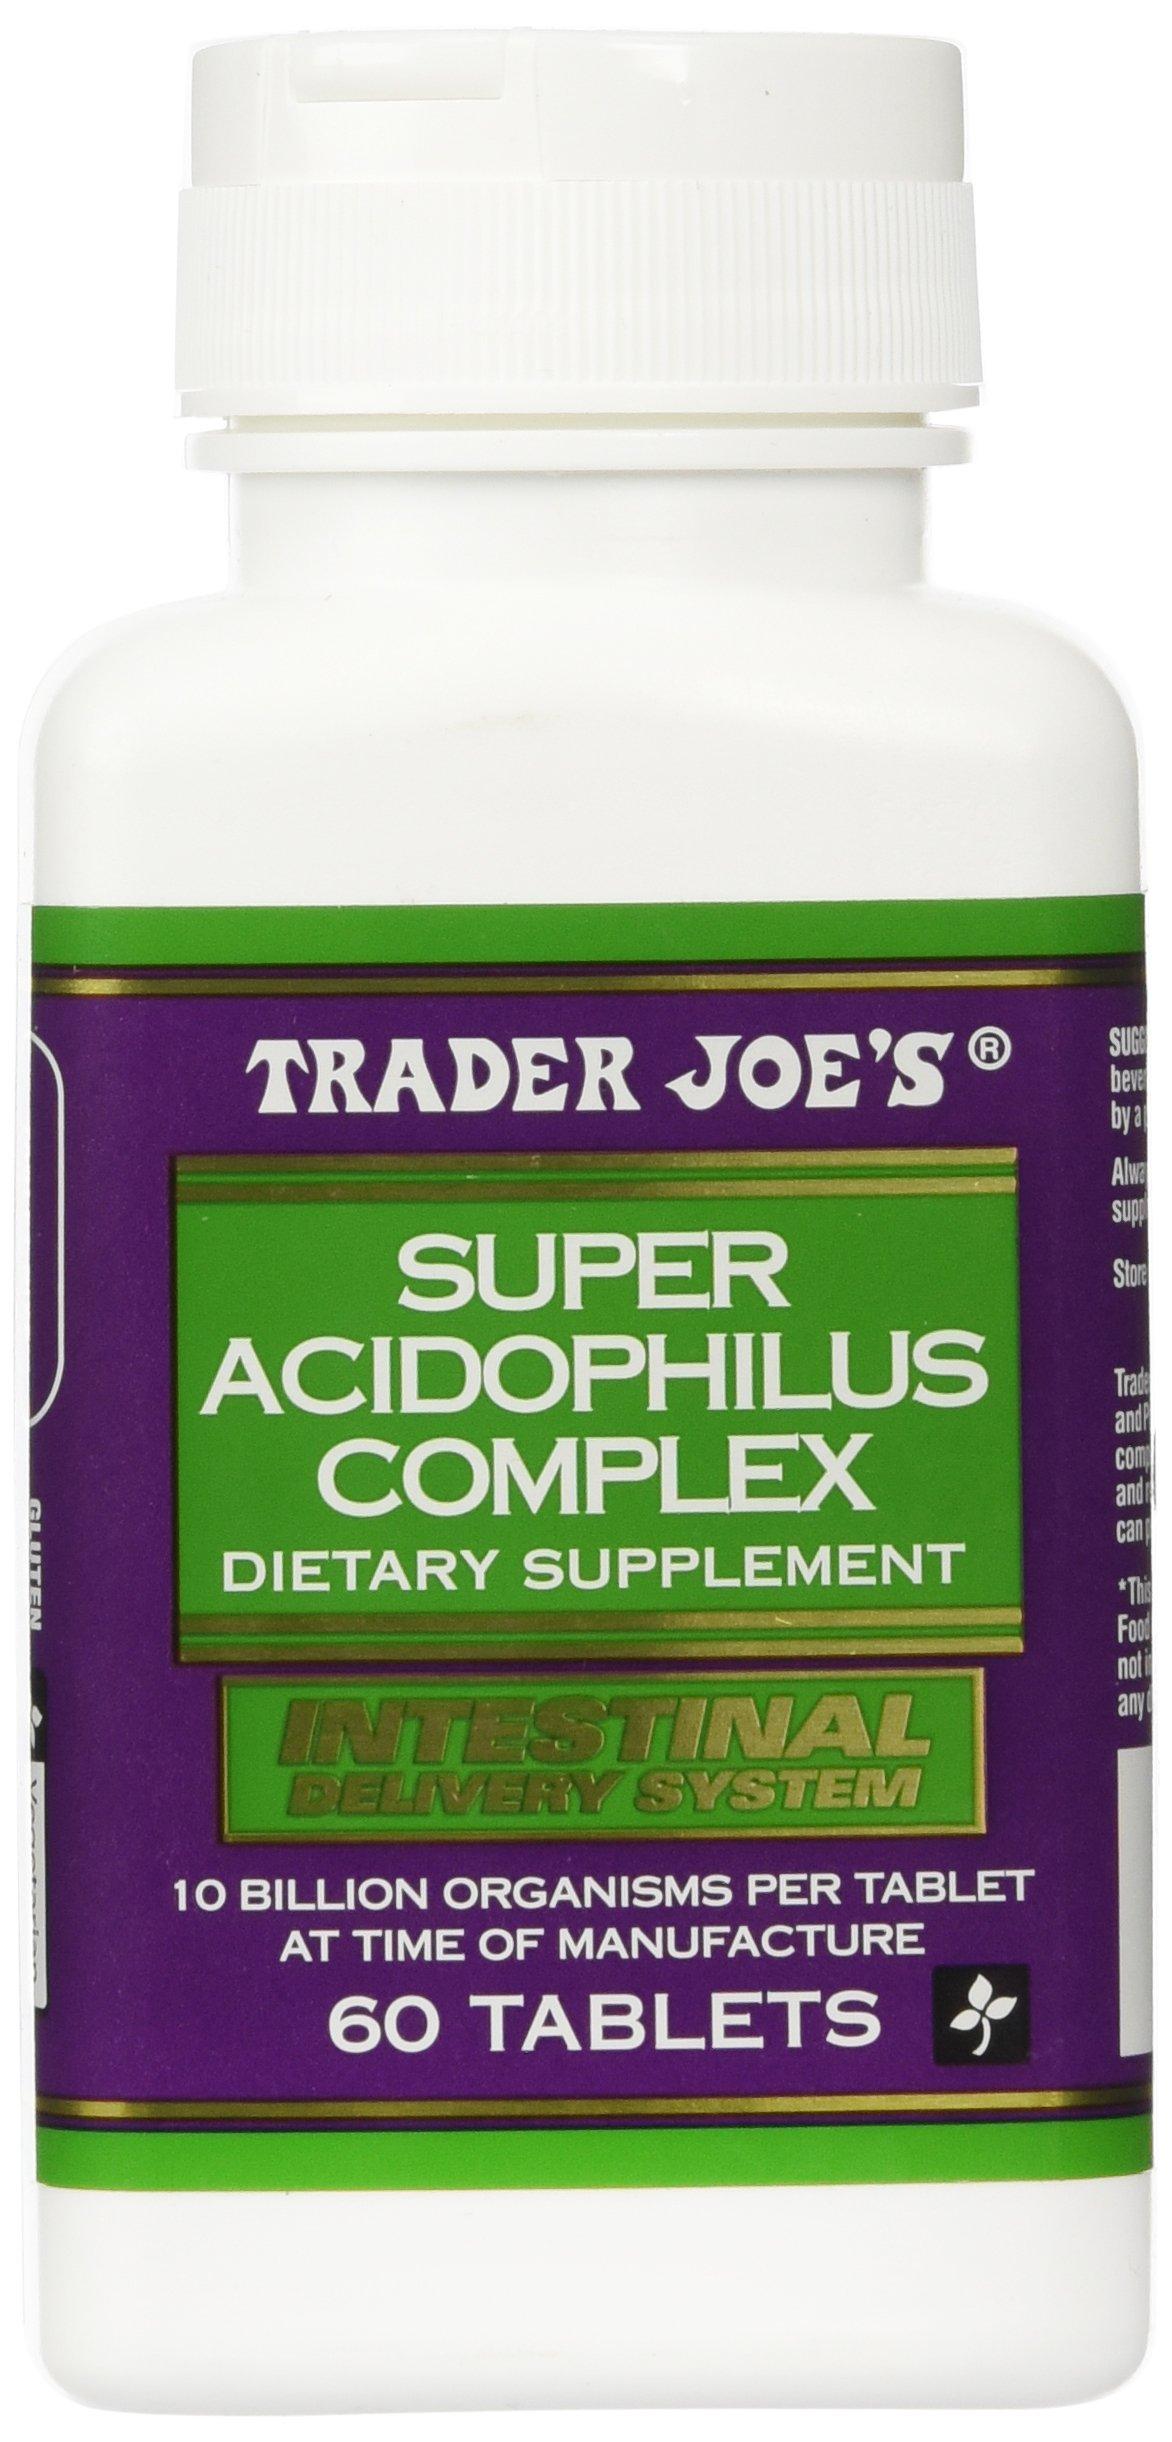 Trader Joe's Super Acidophilus Complex, 60 Tablets, 10 Billion Organisms Per Tablet (At Time Of Manufacture)